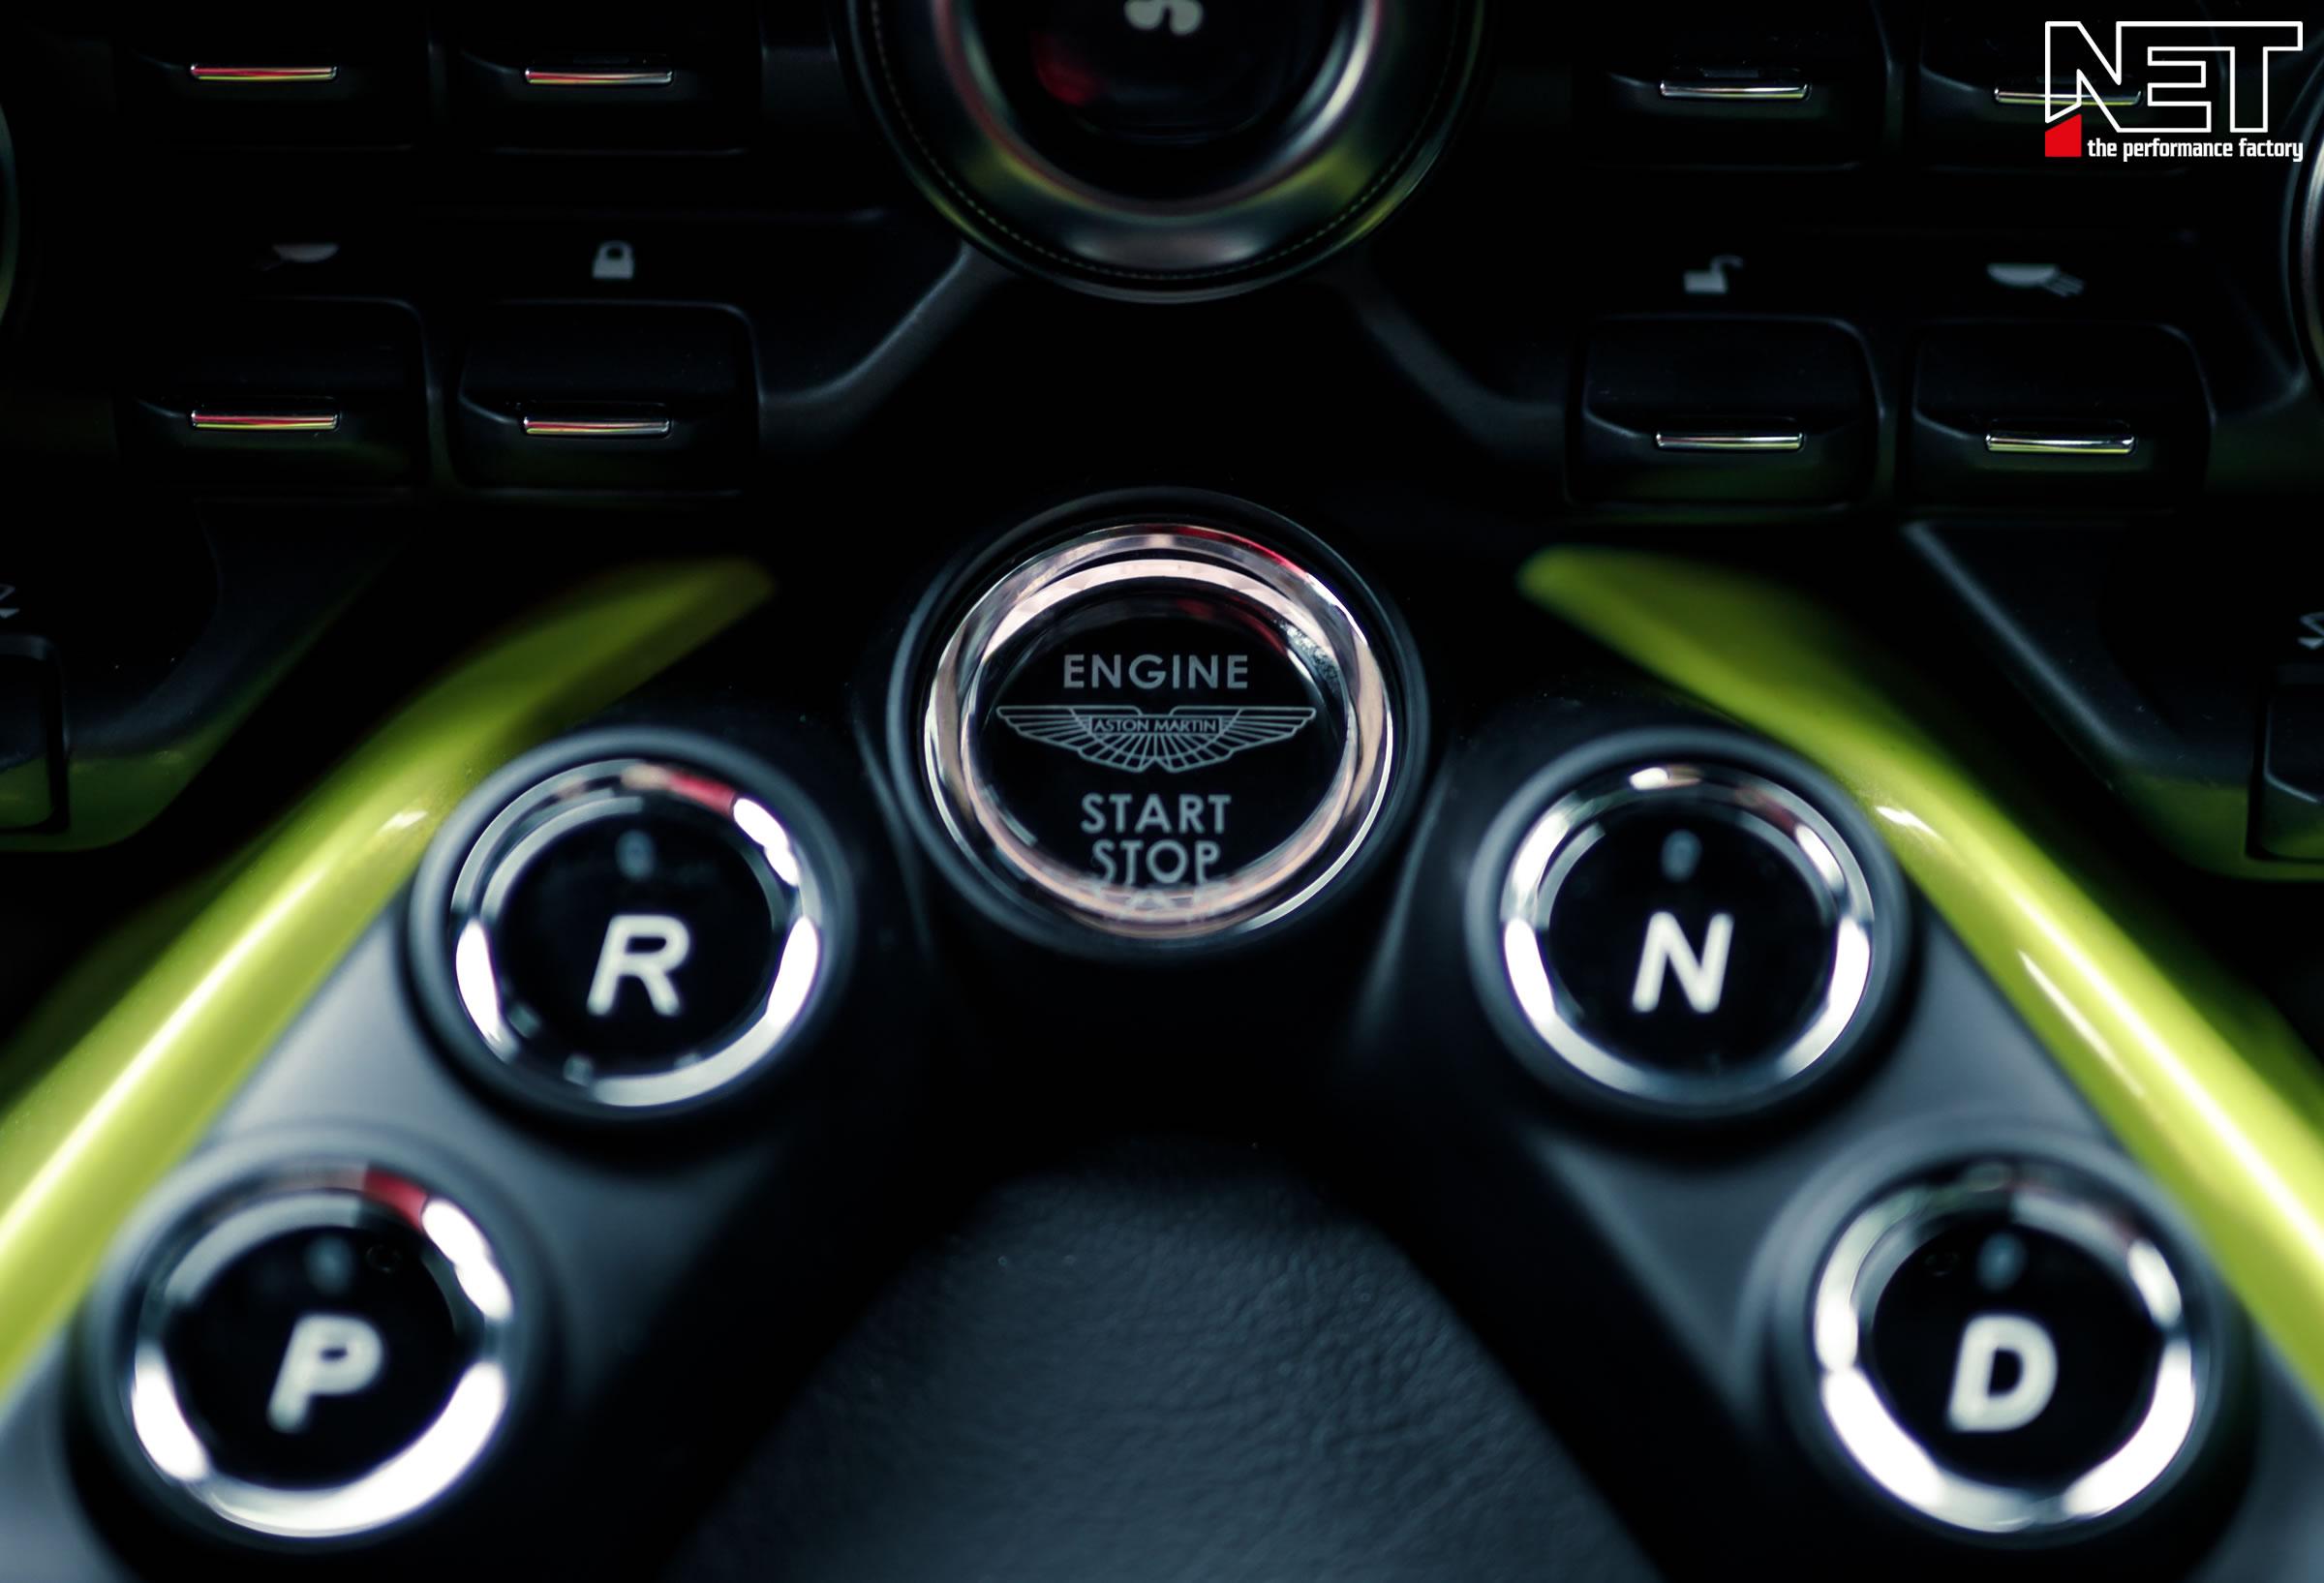 Net Galerie Car Tuning The New Aston Martin Vantage Mj 2018 Chiptuning Aston Martin 1 1